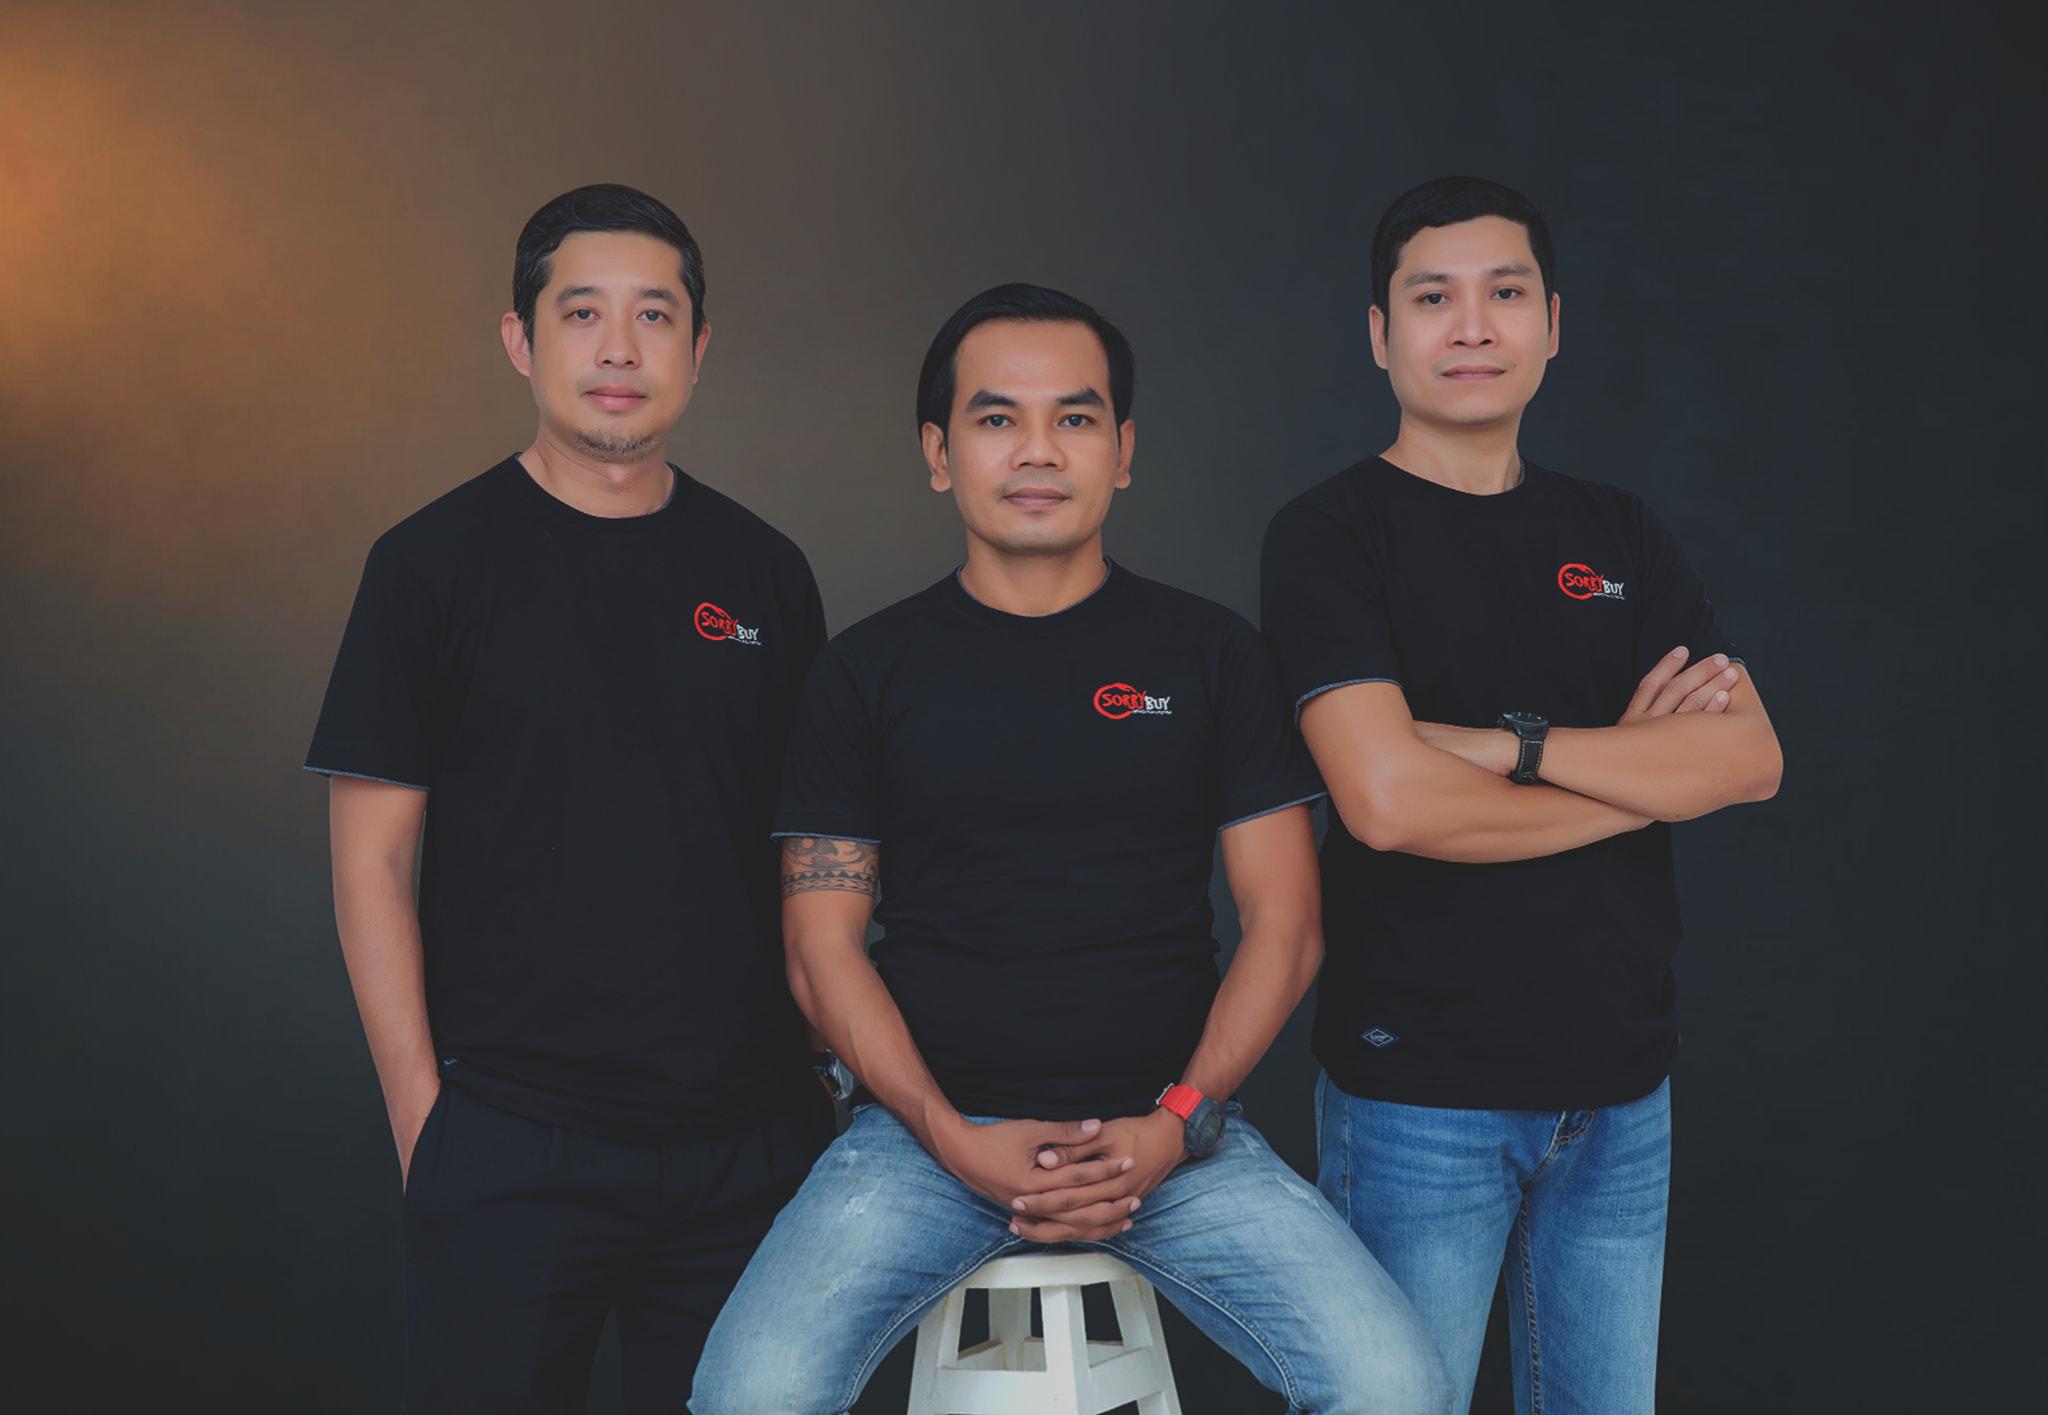 SorryBuy Team Cambodia Online Shop